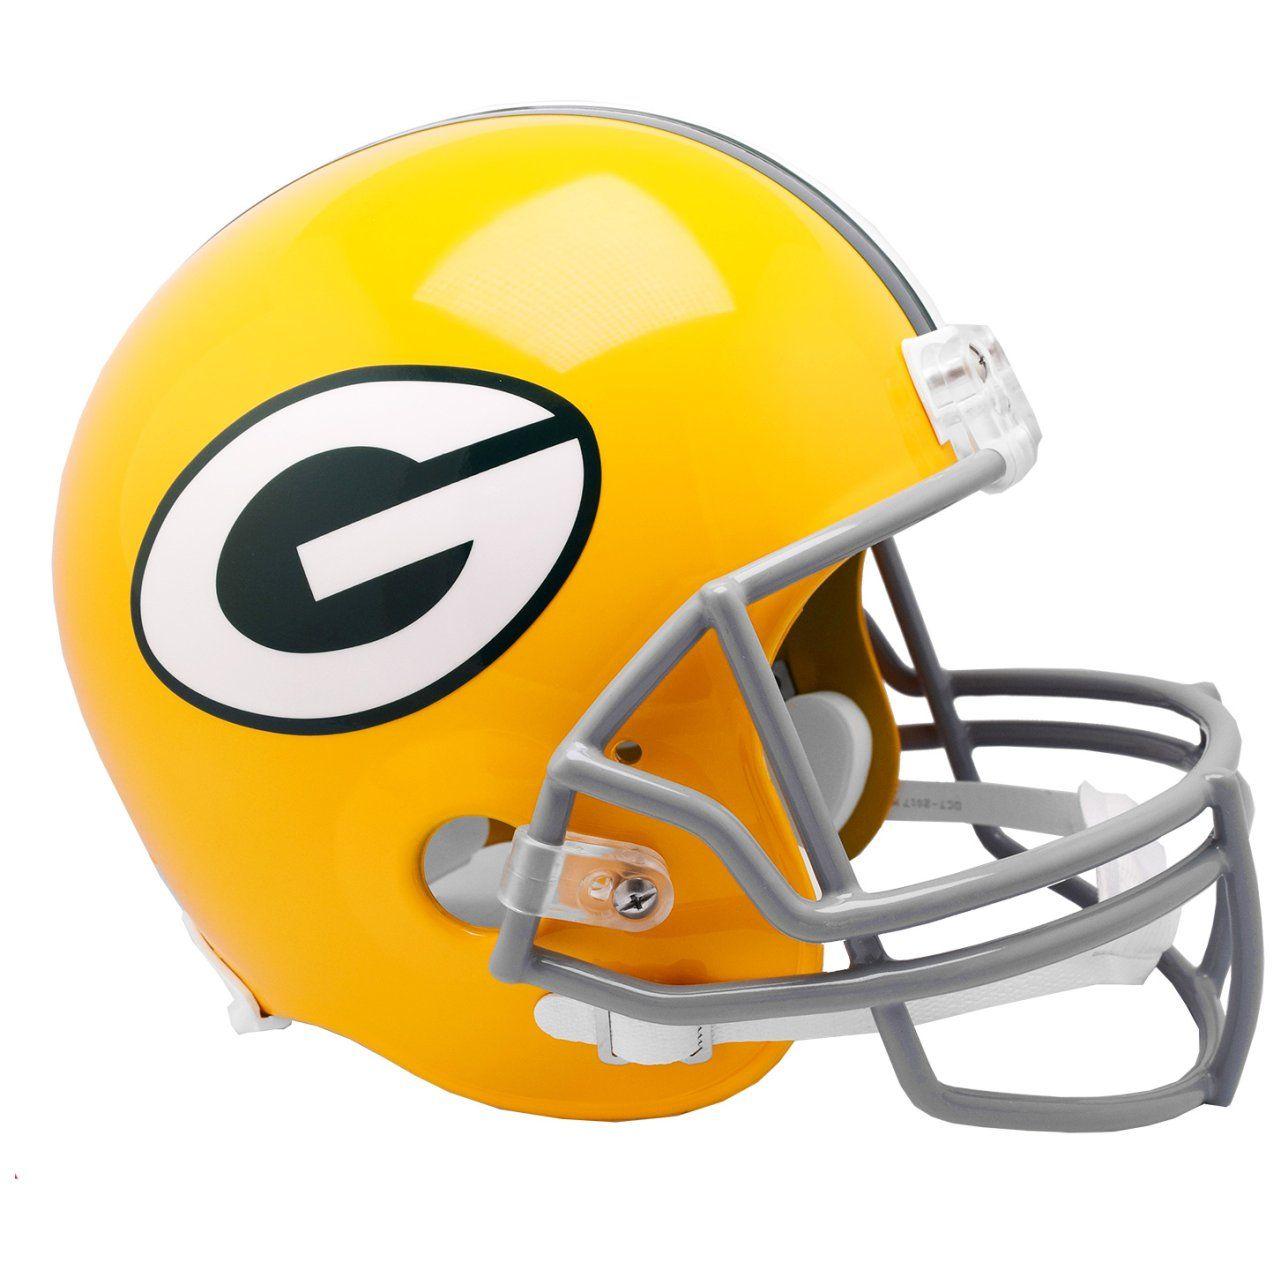 amfoo - Riddell VSR4 Replica Football Helm - Green Bay Packers 61-79